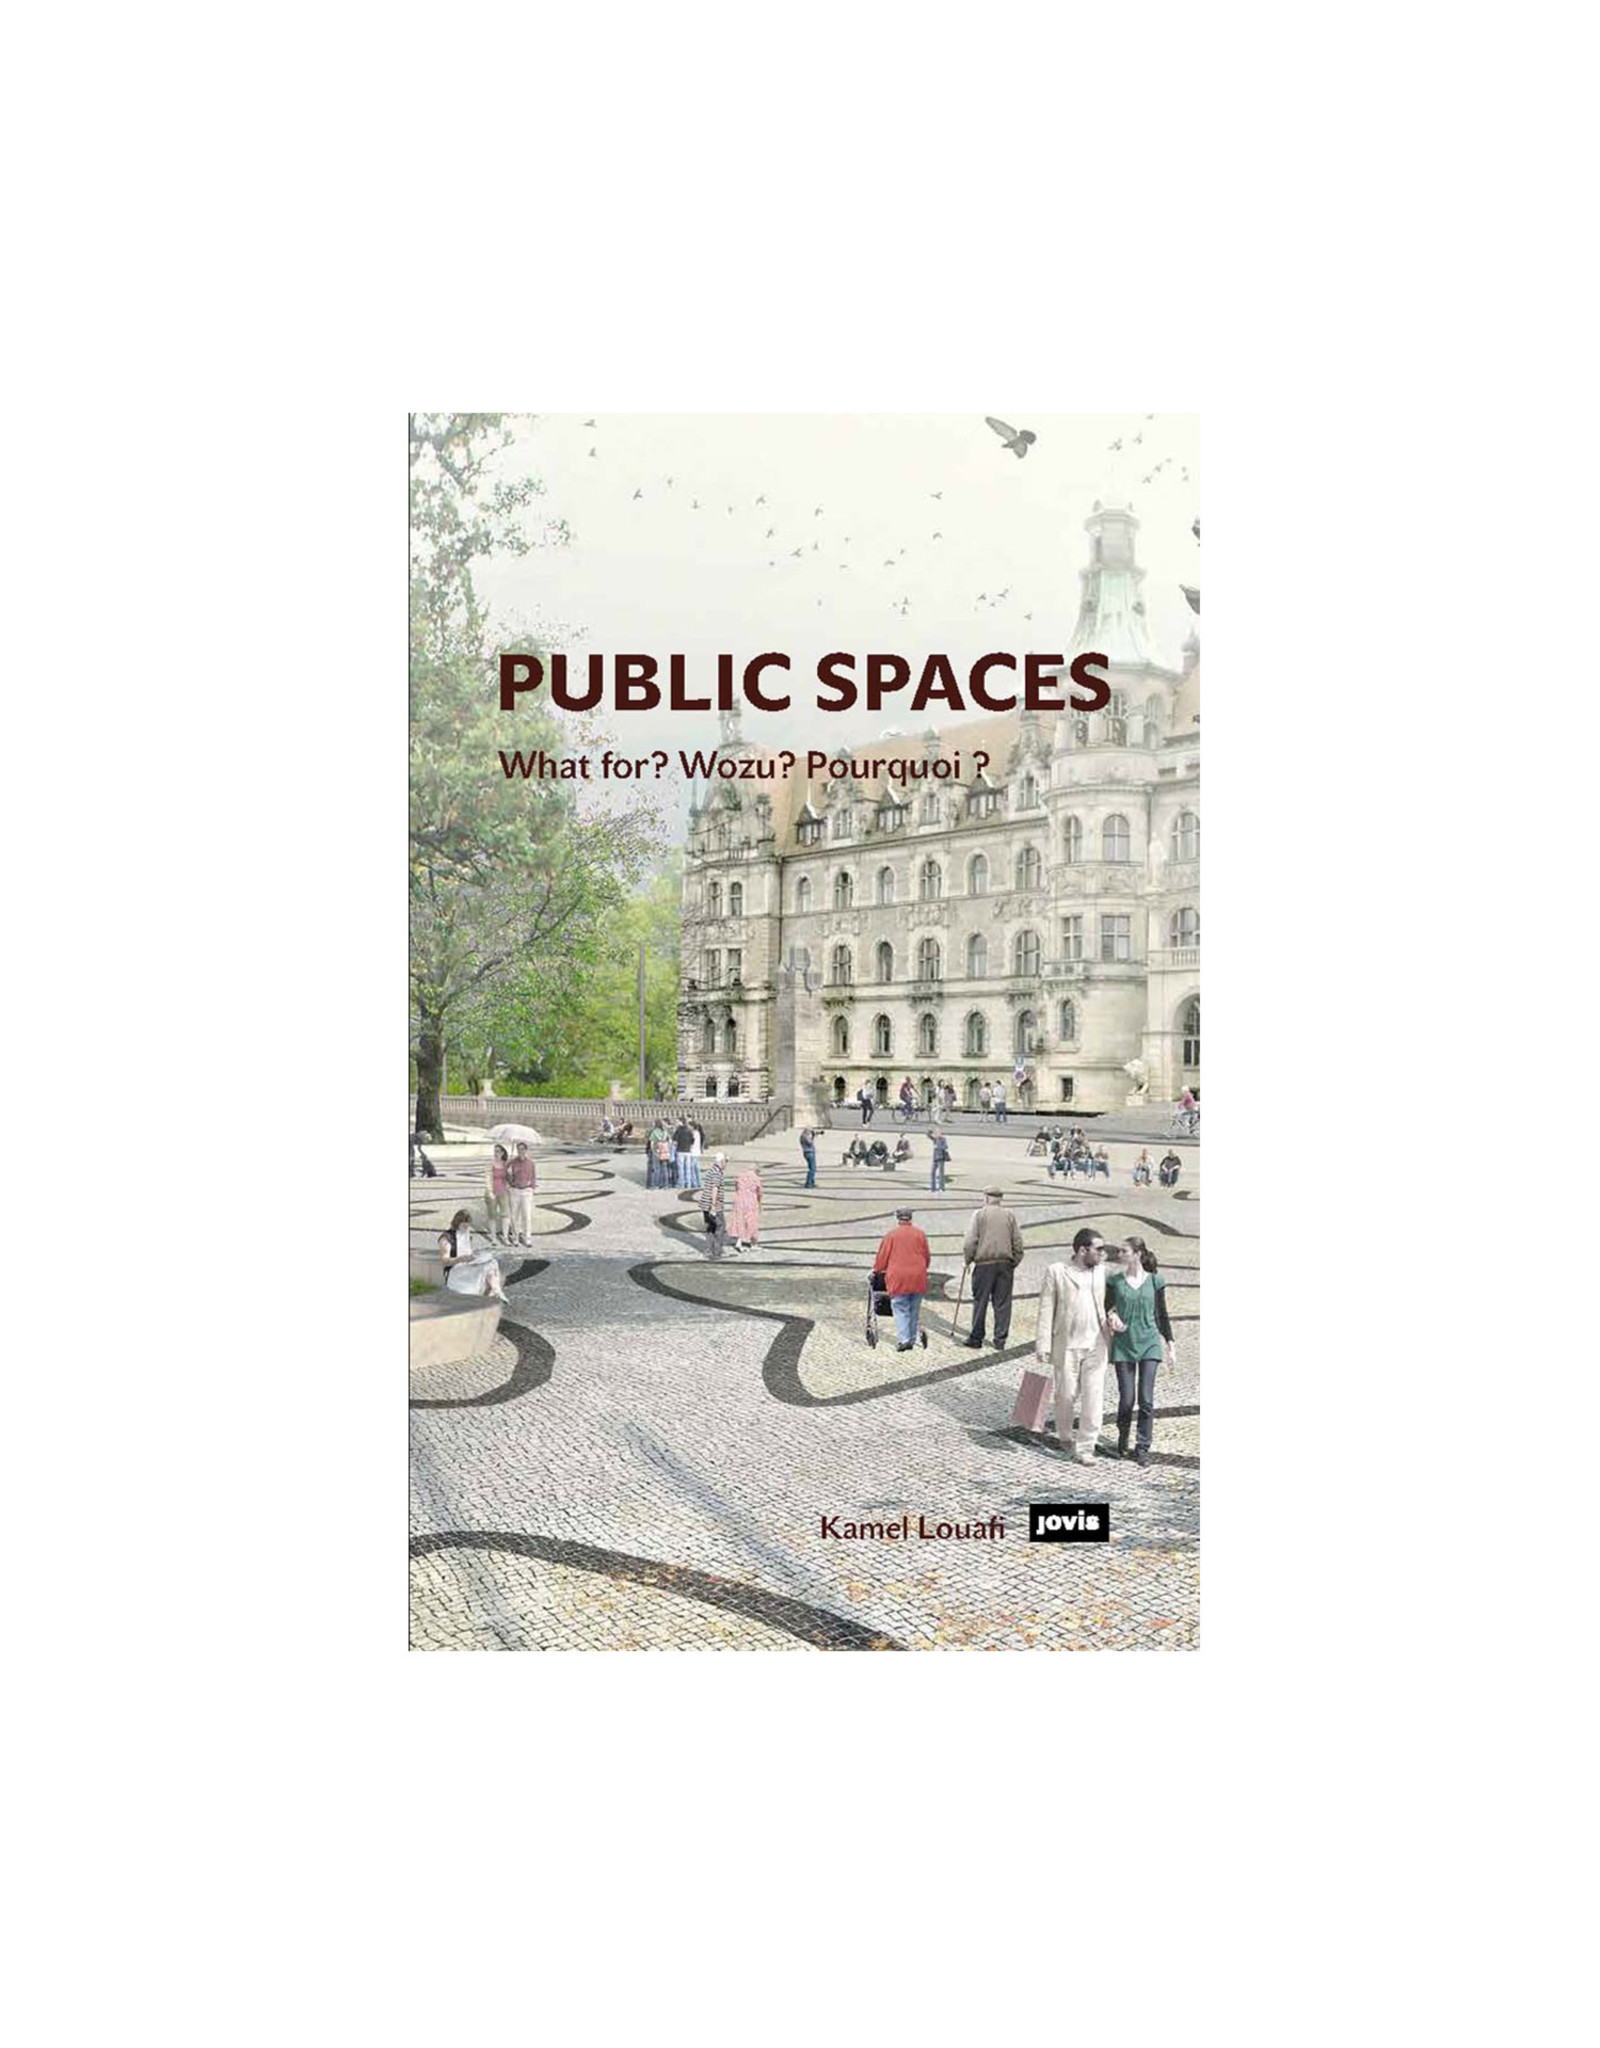 Public Spaces: What for? Wozu? Pourquoi?